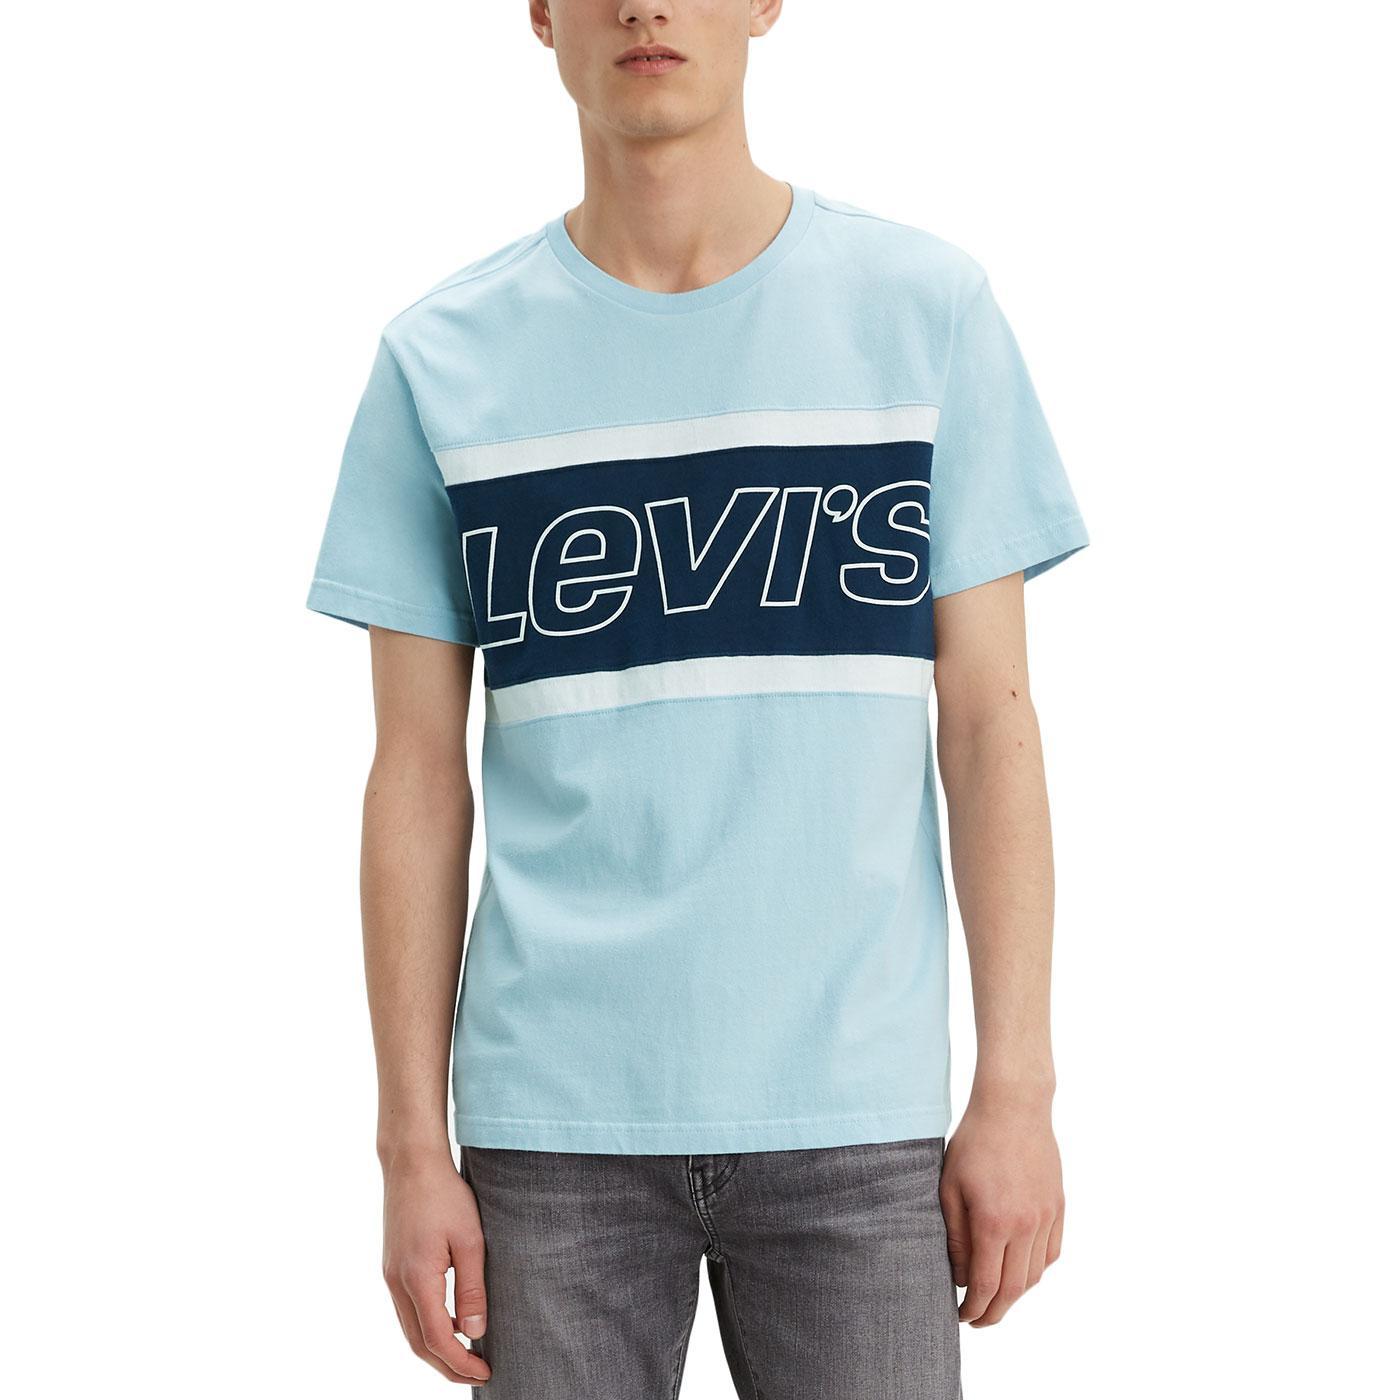 LEVI'S Retro Cut & Sew Colour Block Logo Tee W